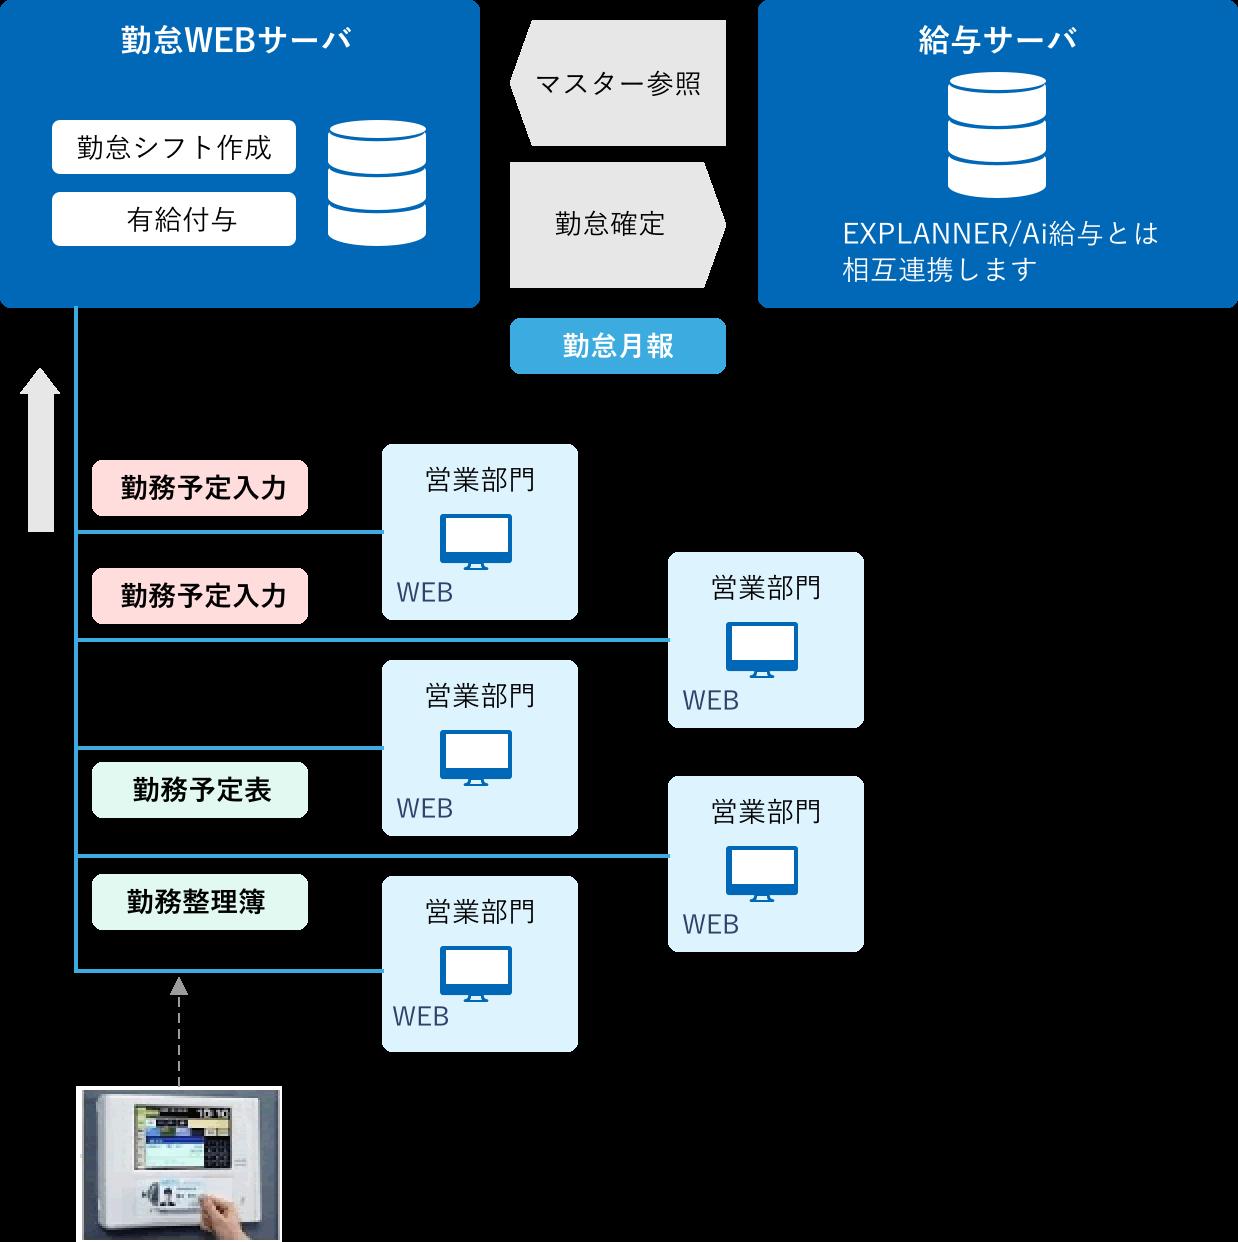 EXPLANNER/Ai人事・給与連携 WEB勤怠管理システム〈Smart Worker〉│データの流れ